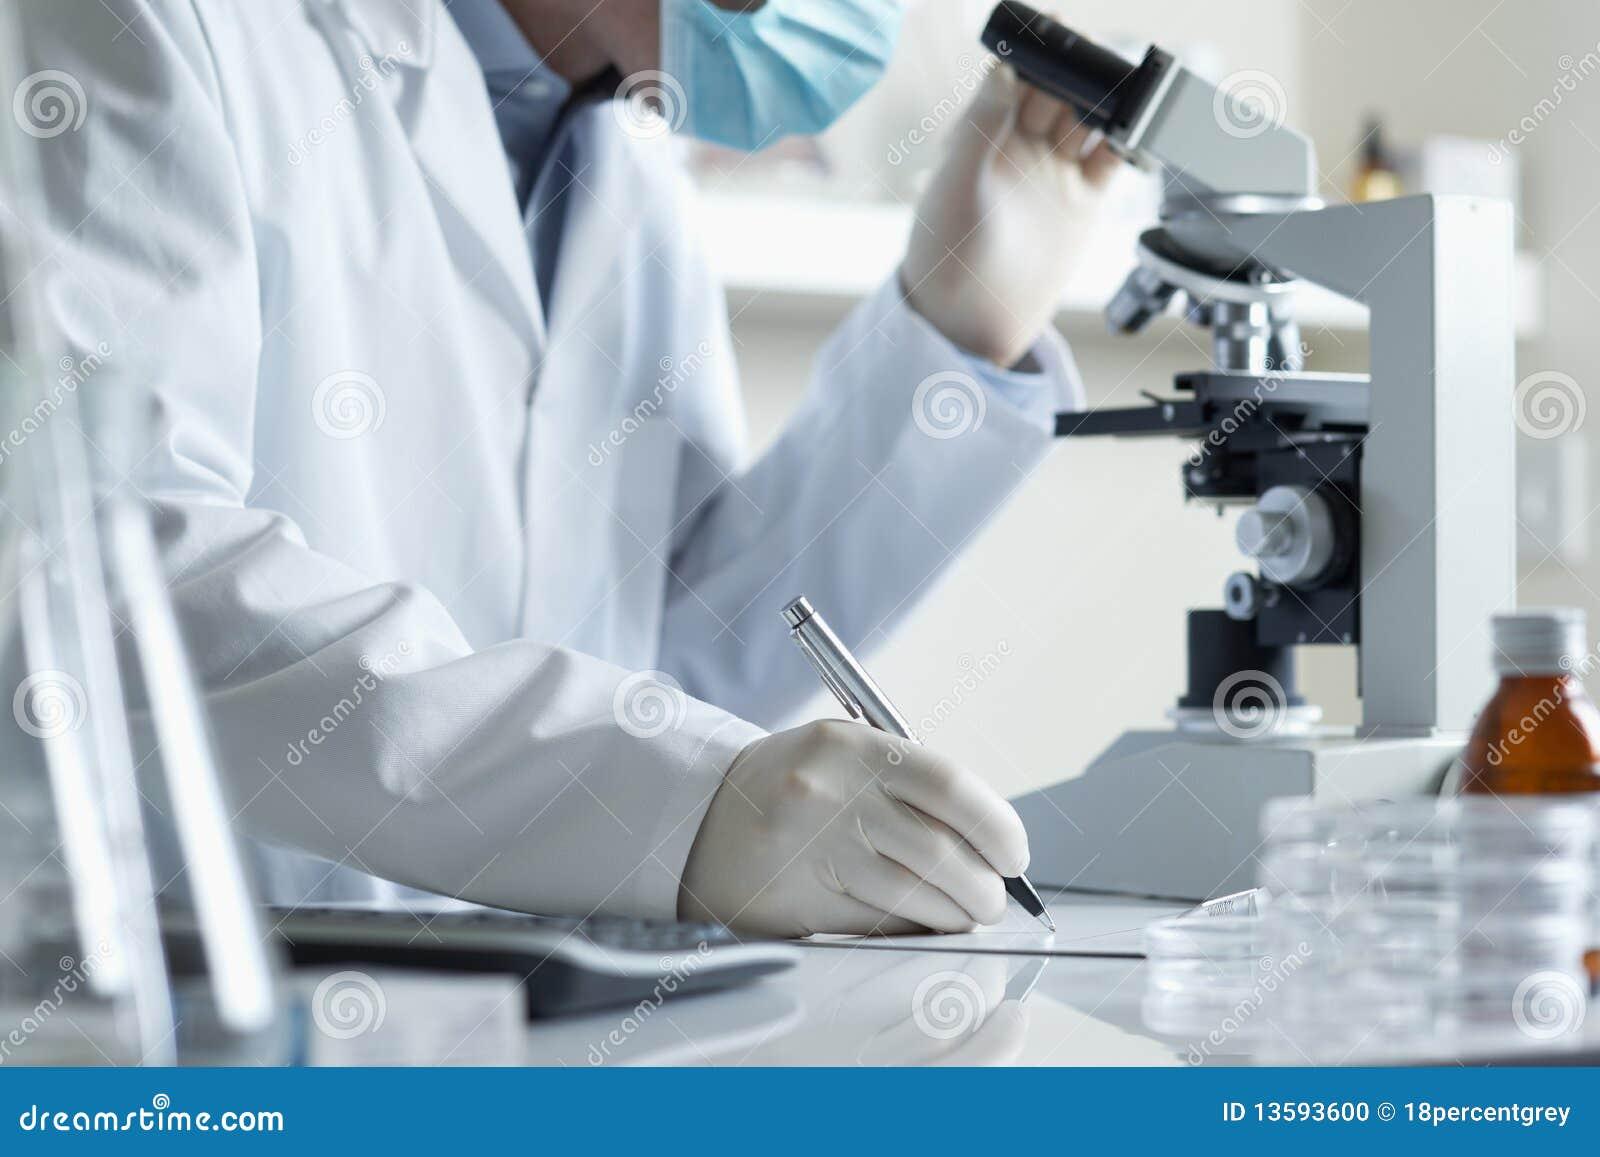 Wissenschaftlerleitforschung mit Mikroskop